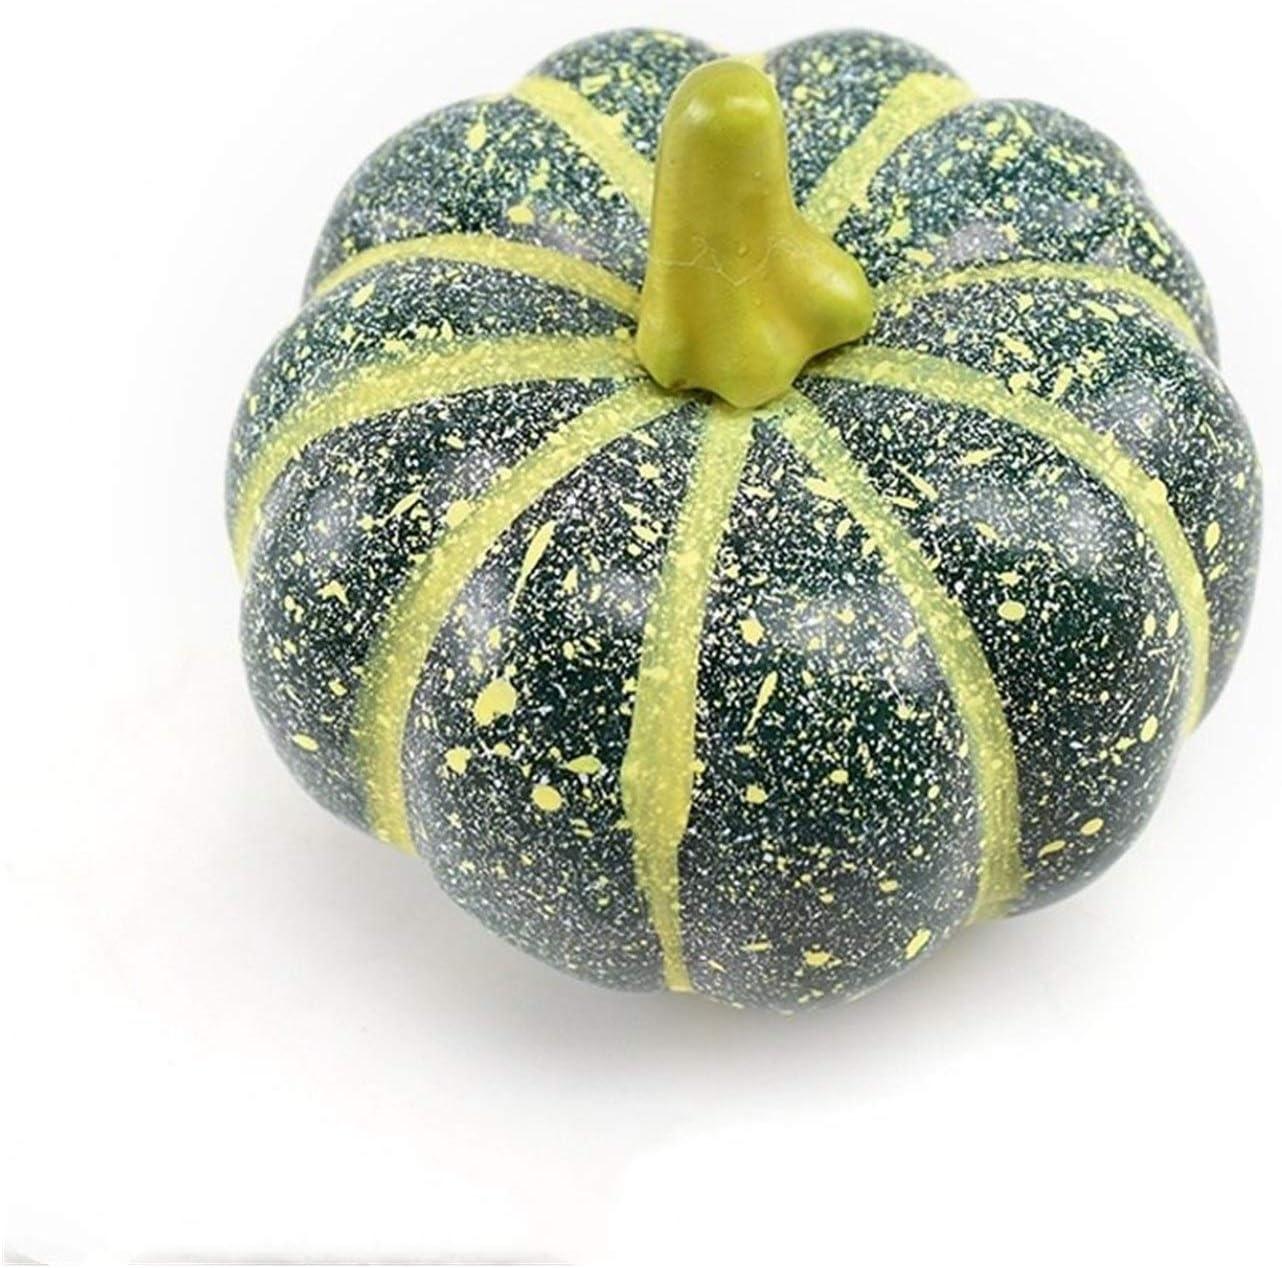 Liuhyun Artificial Vegetables 1pc Simulation Direct stock discount Mini Food trend rank A Pumpkin